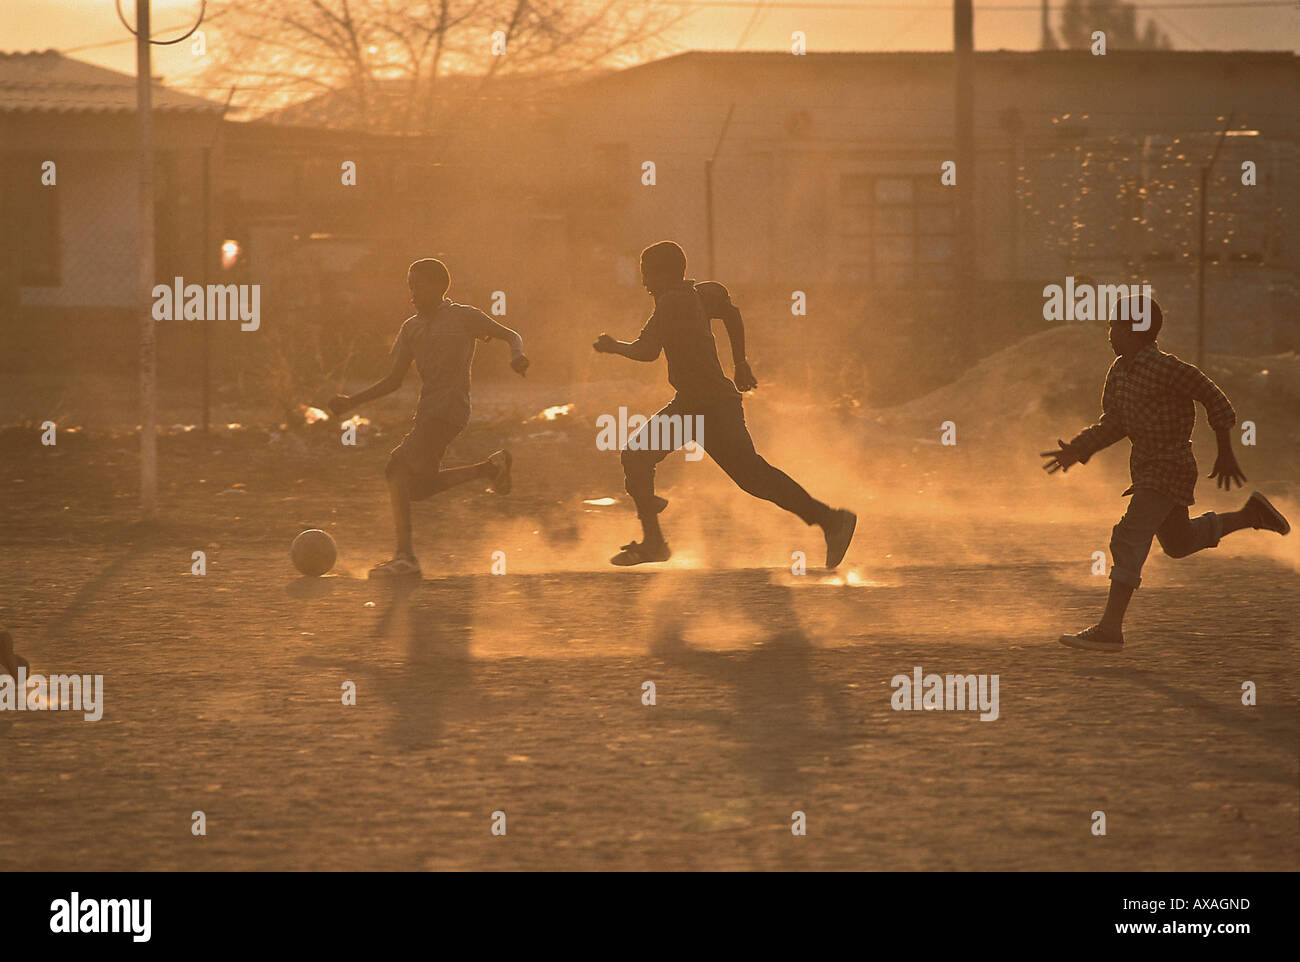 Jungen spielen Fussball, Suedafrika - Stock Image